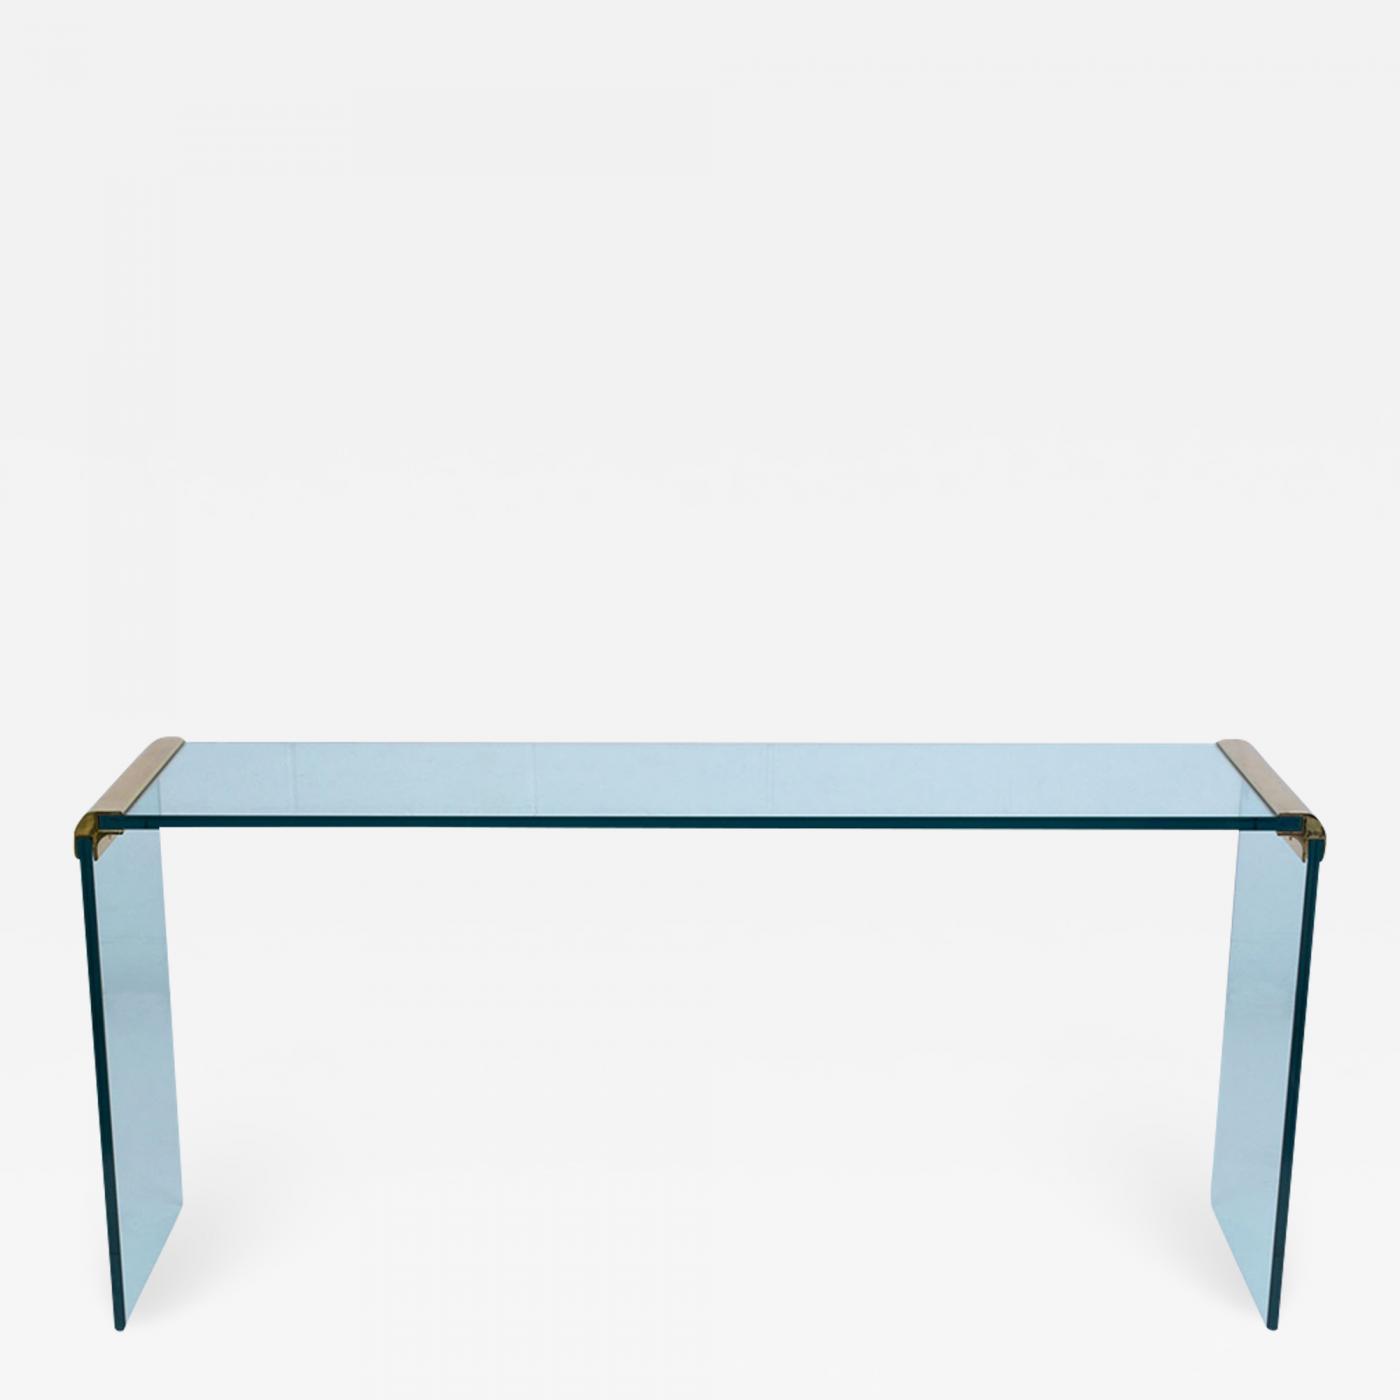 Fantastic Modern Chrome Glass Console Table Inzonedesignstudio Interior Chair Design Inzonedesignstudiocom